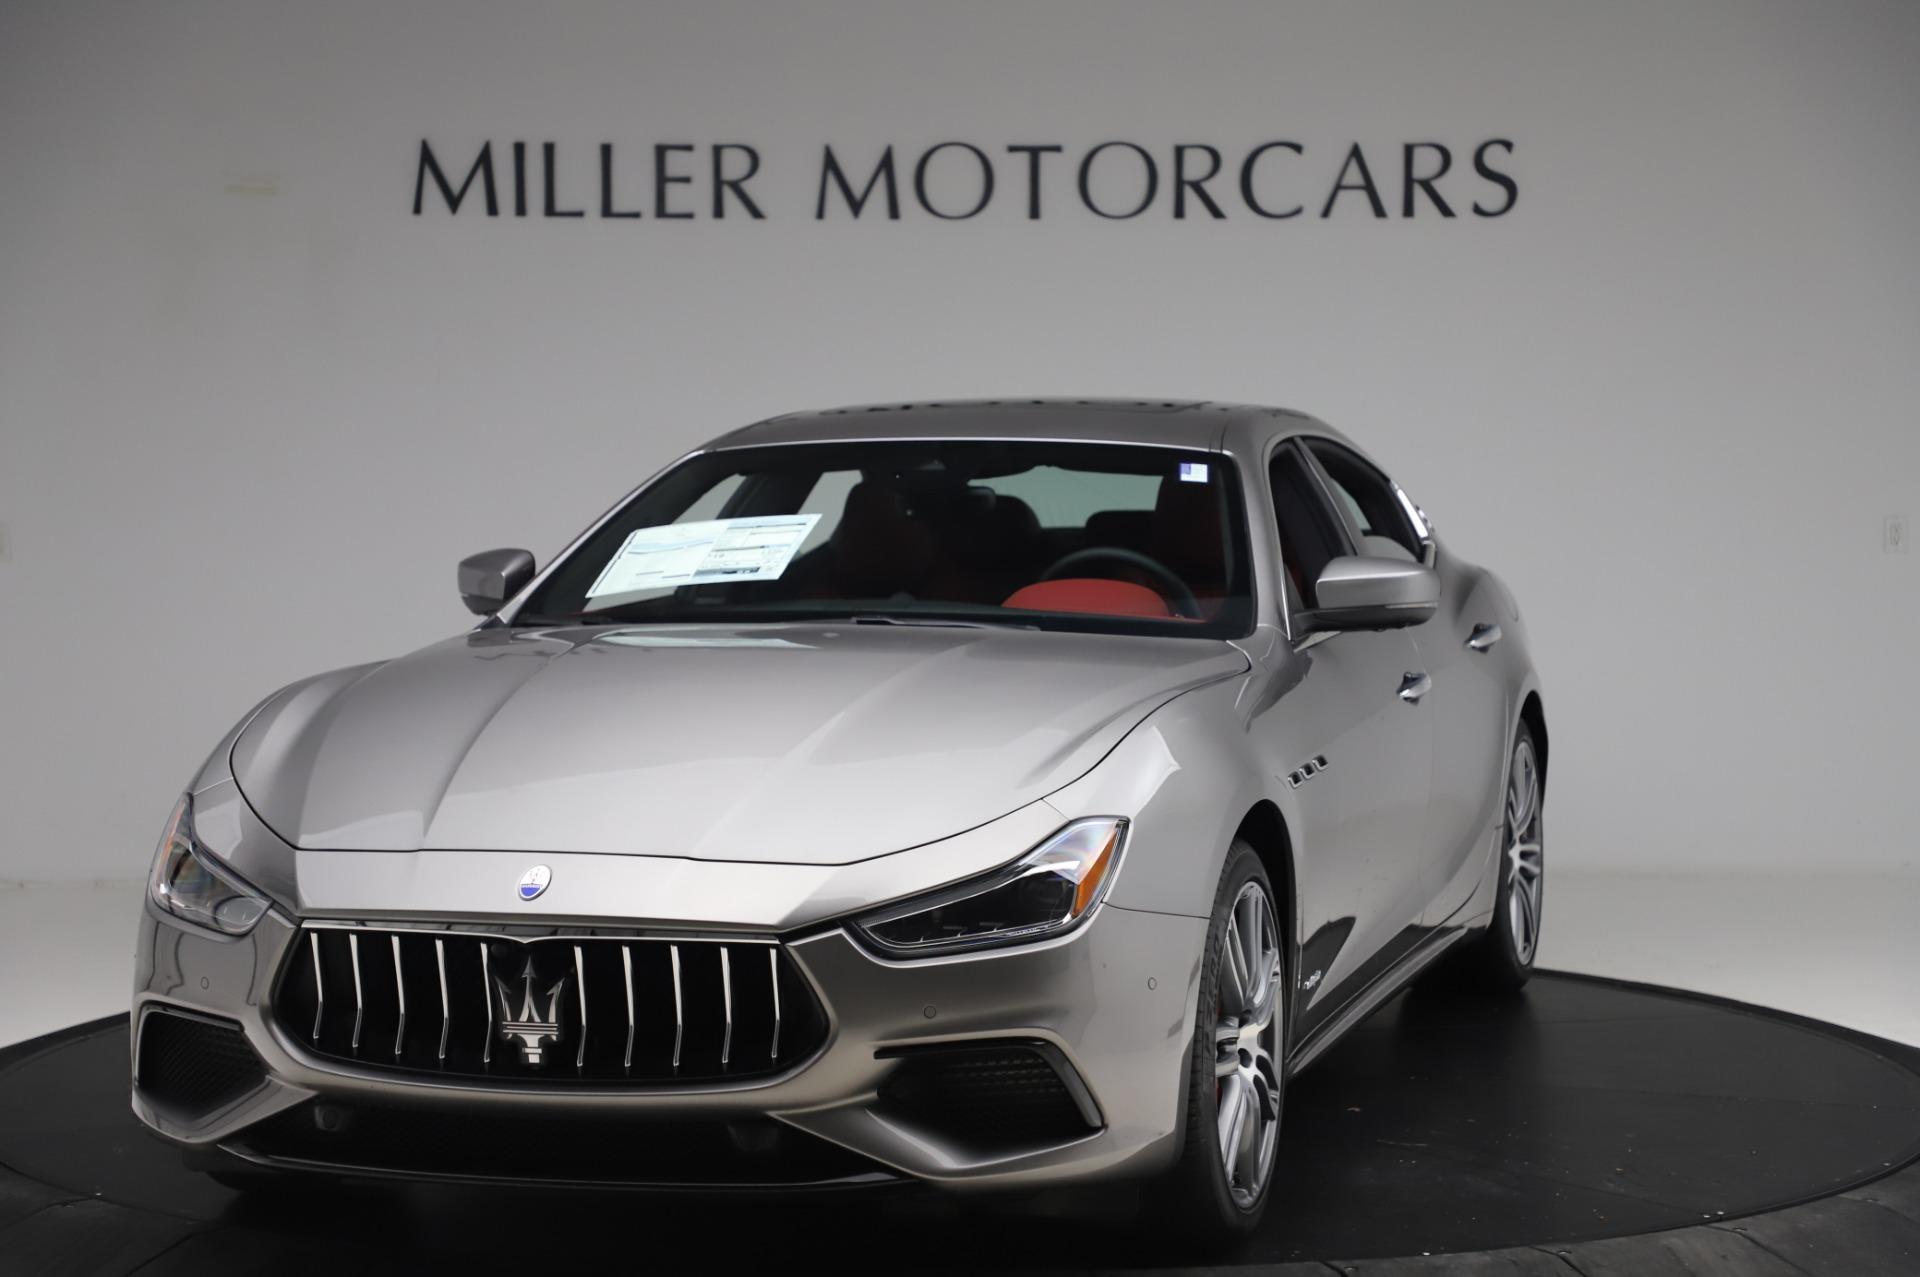 New 2020 Maserati Ghibli S Q4 GranSport for sale $93,285 at Maserati of Greenwich in Greenwich CT 06830 1